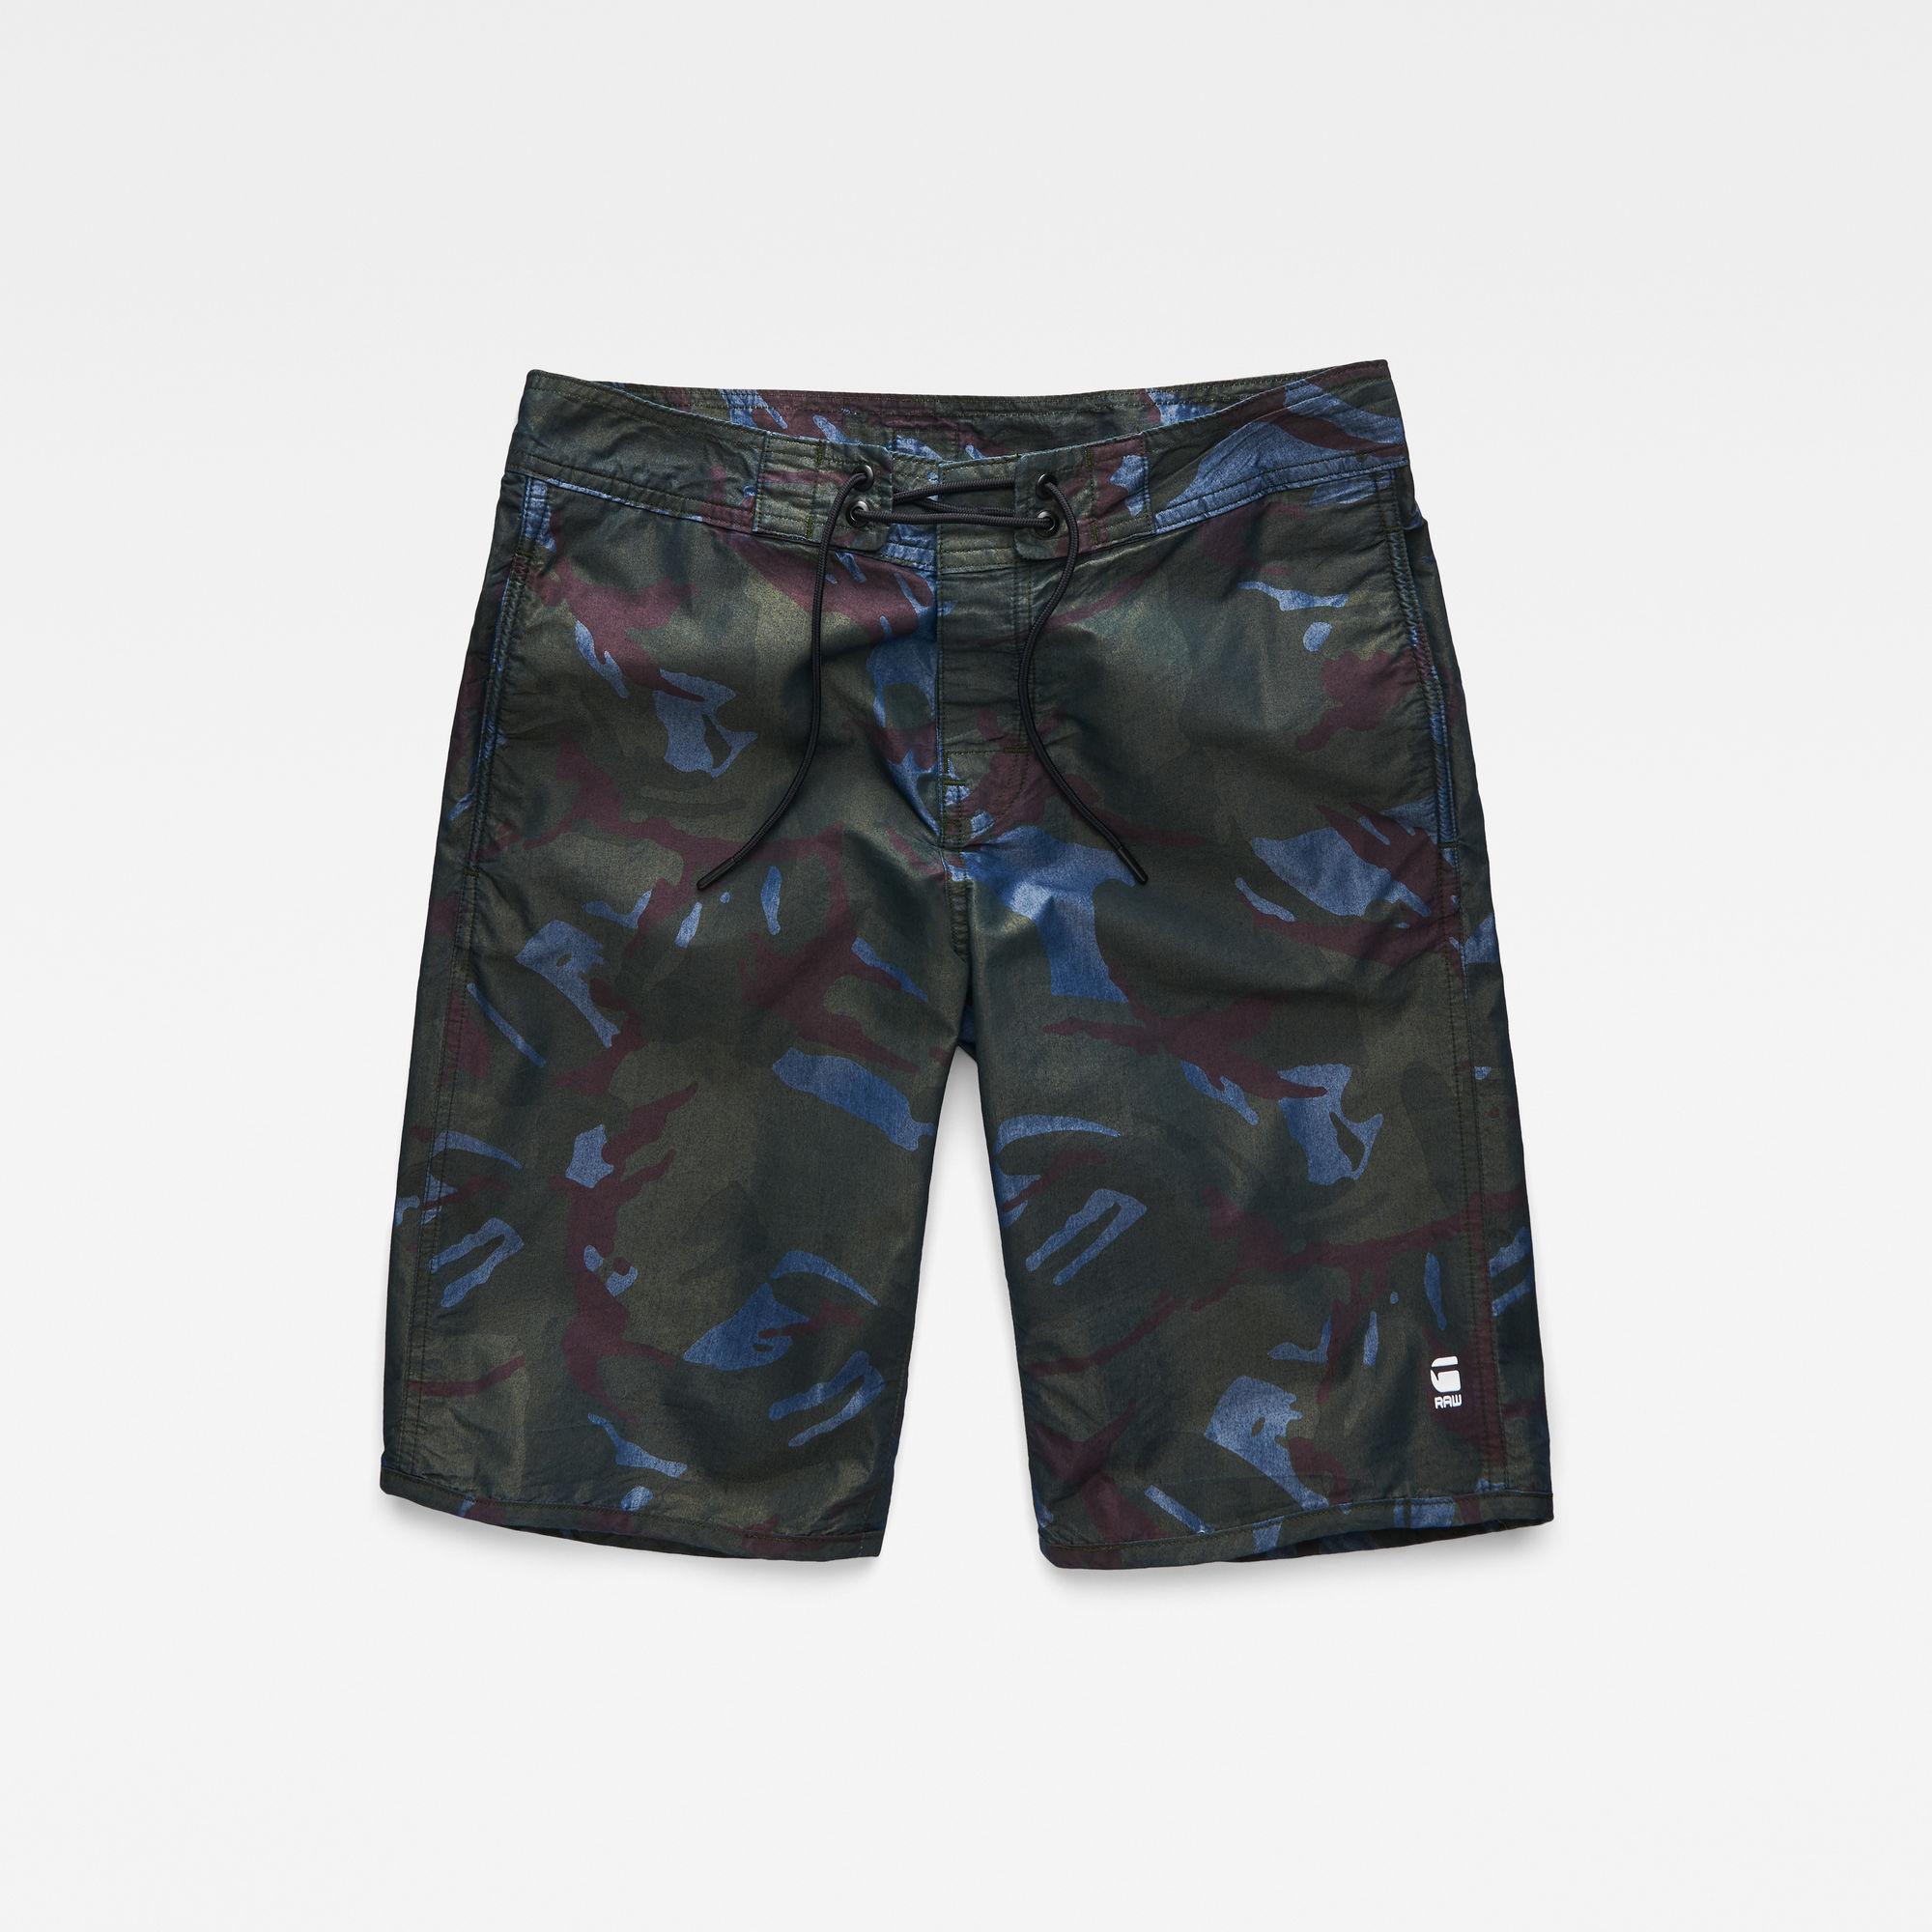 Divad Cord Swim Shorts